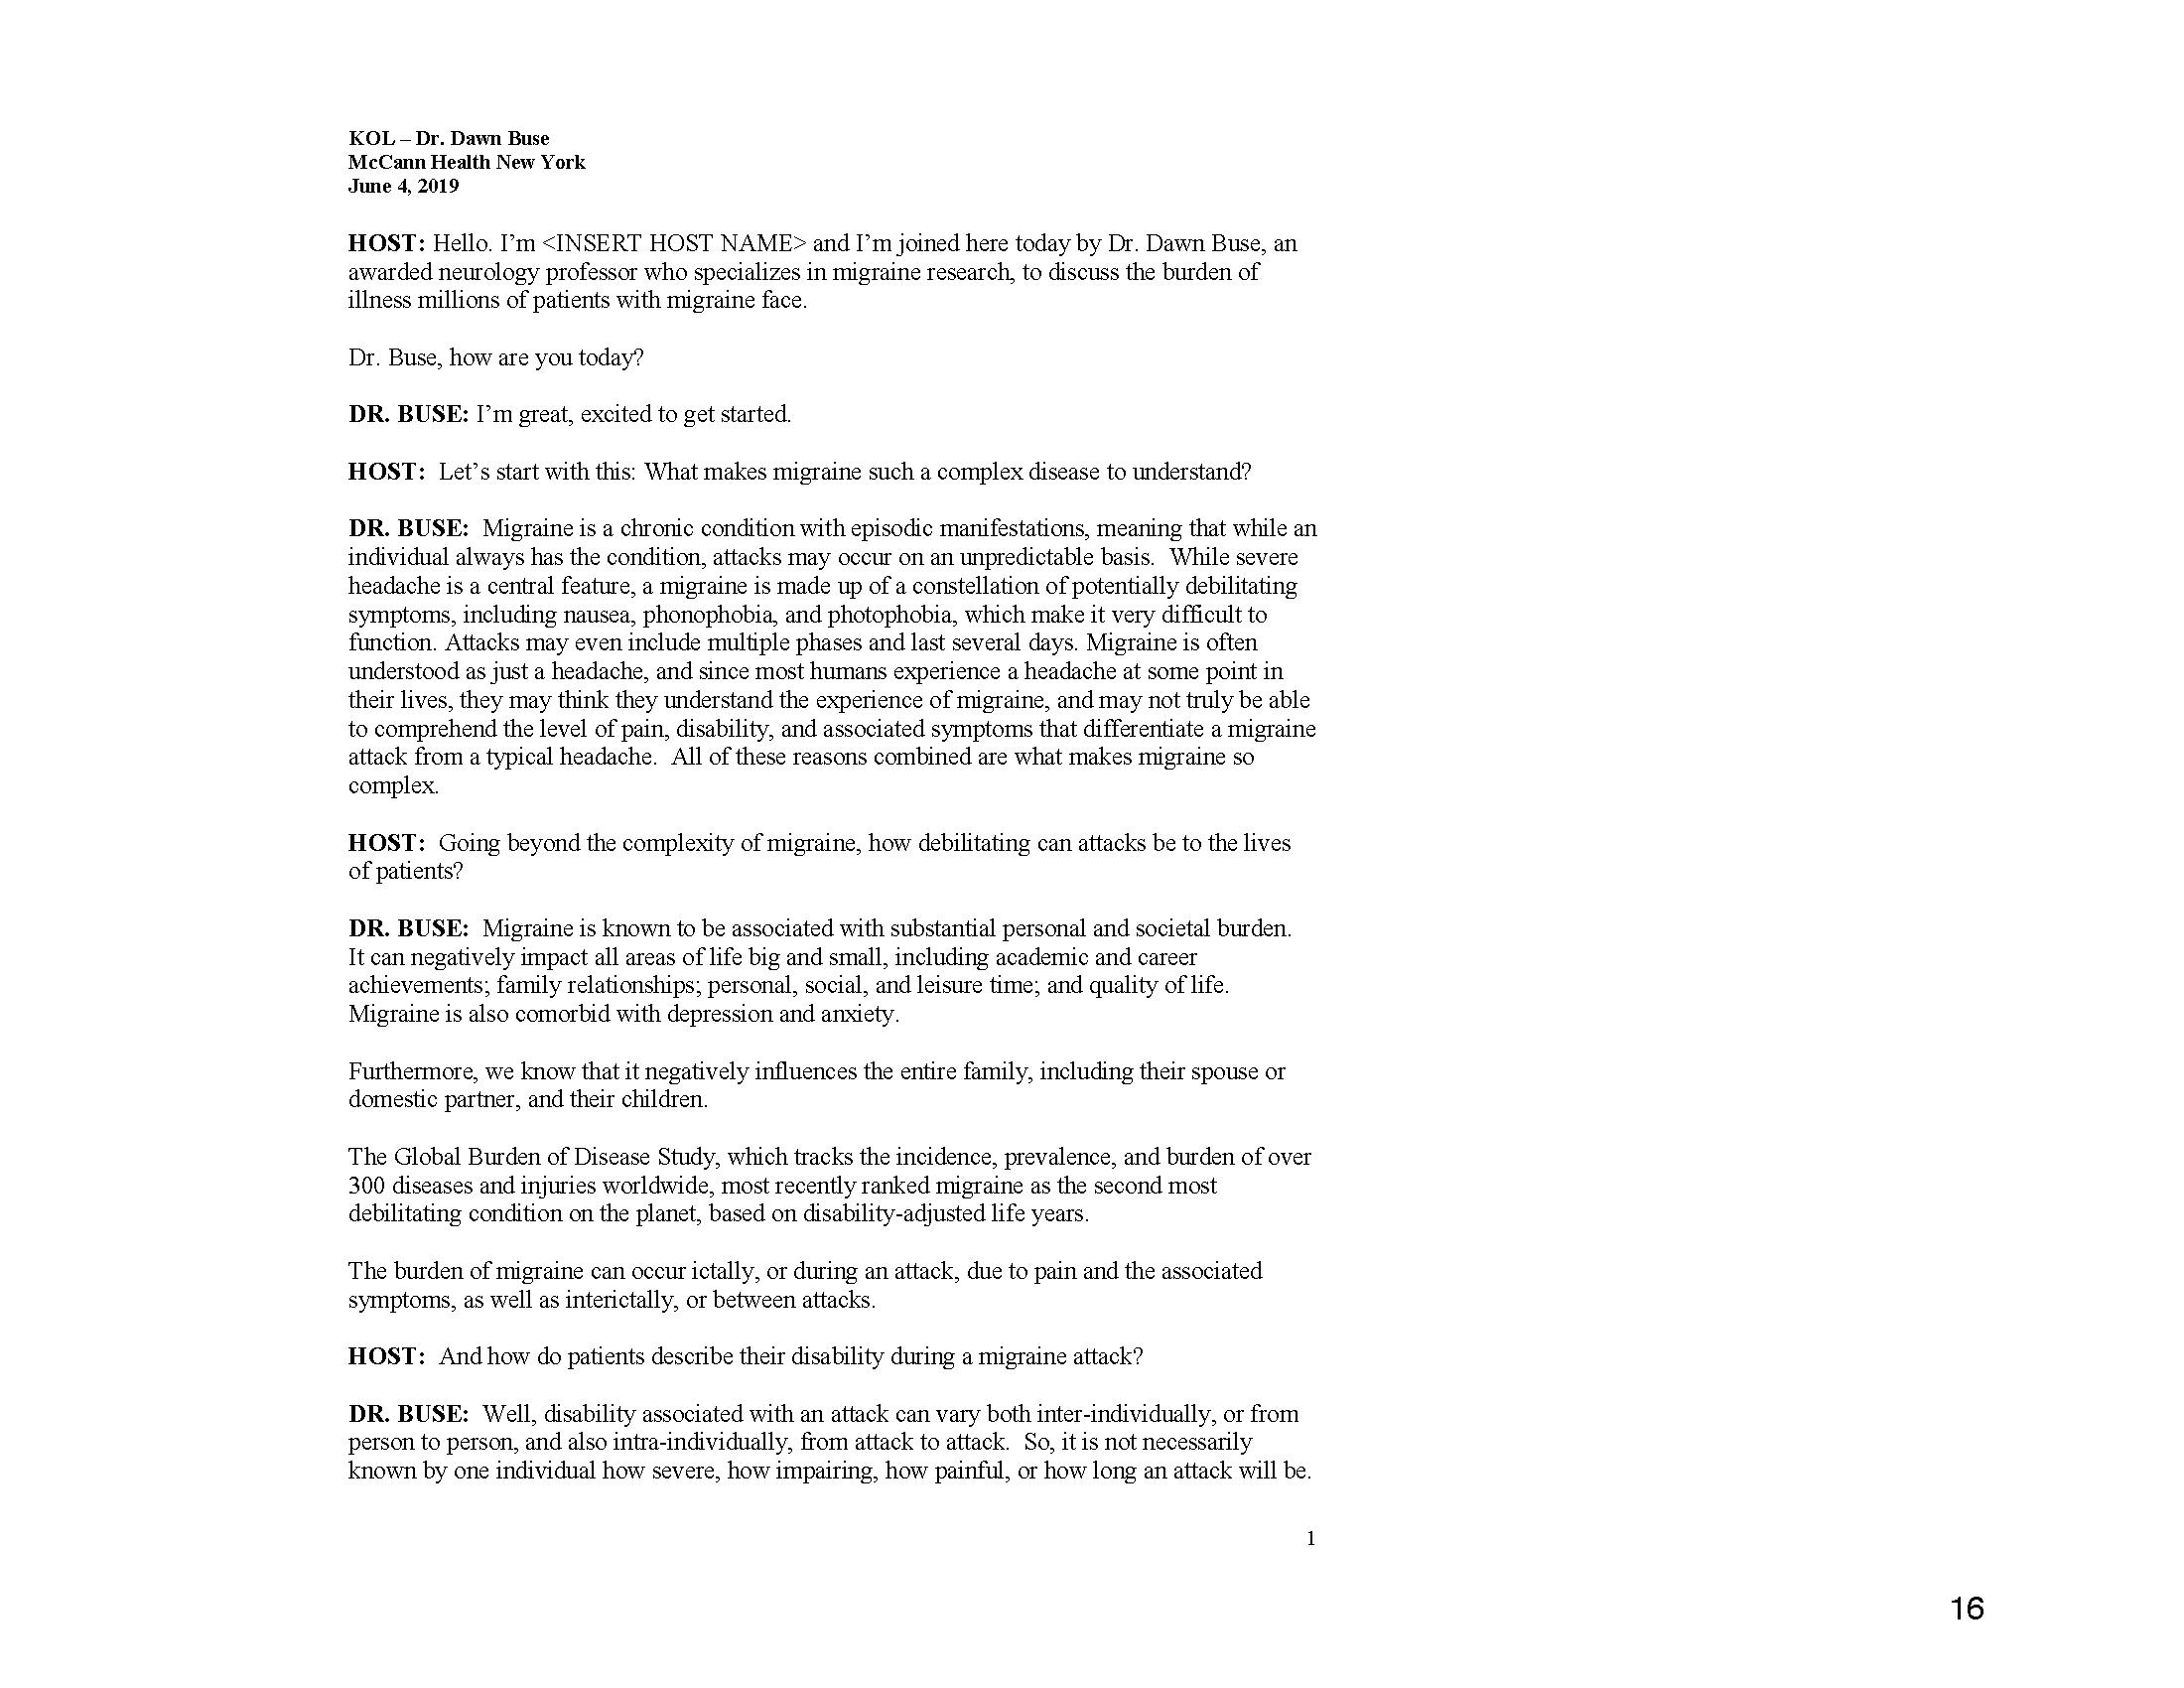 PPB_DSE_KOL_v6_Page_16.png